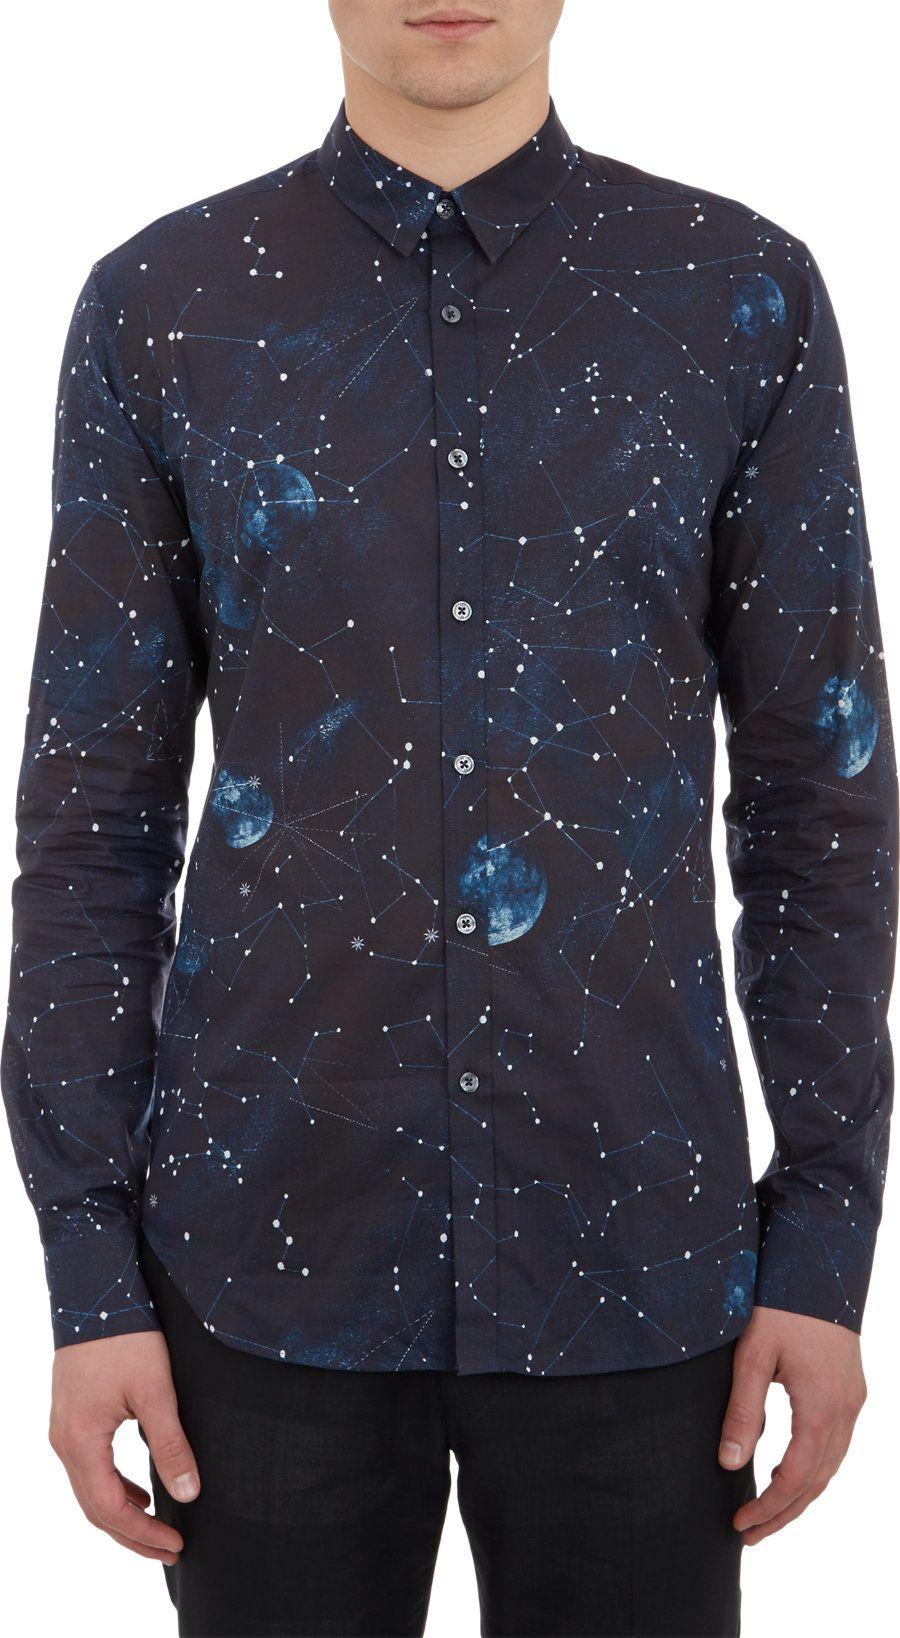 e618163b PS Paul Smith - Cosmos Print Shirt (Navy) | Cool stuff to buy ...